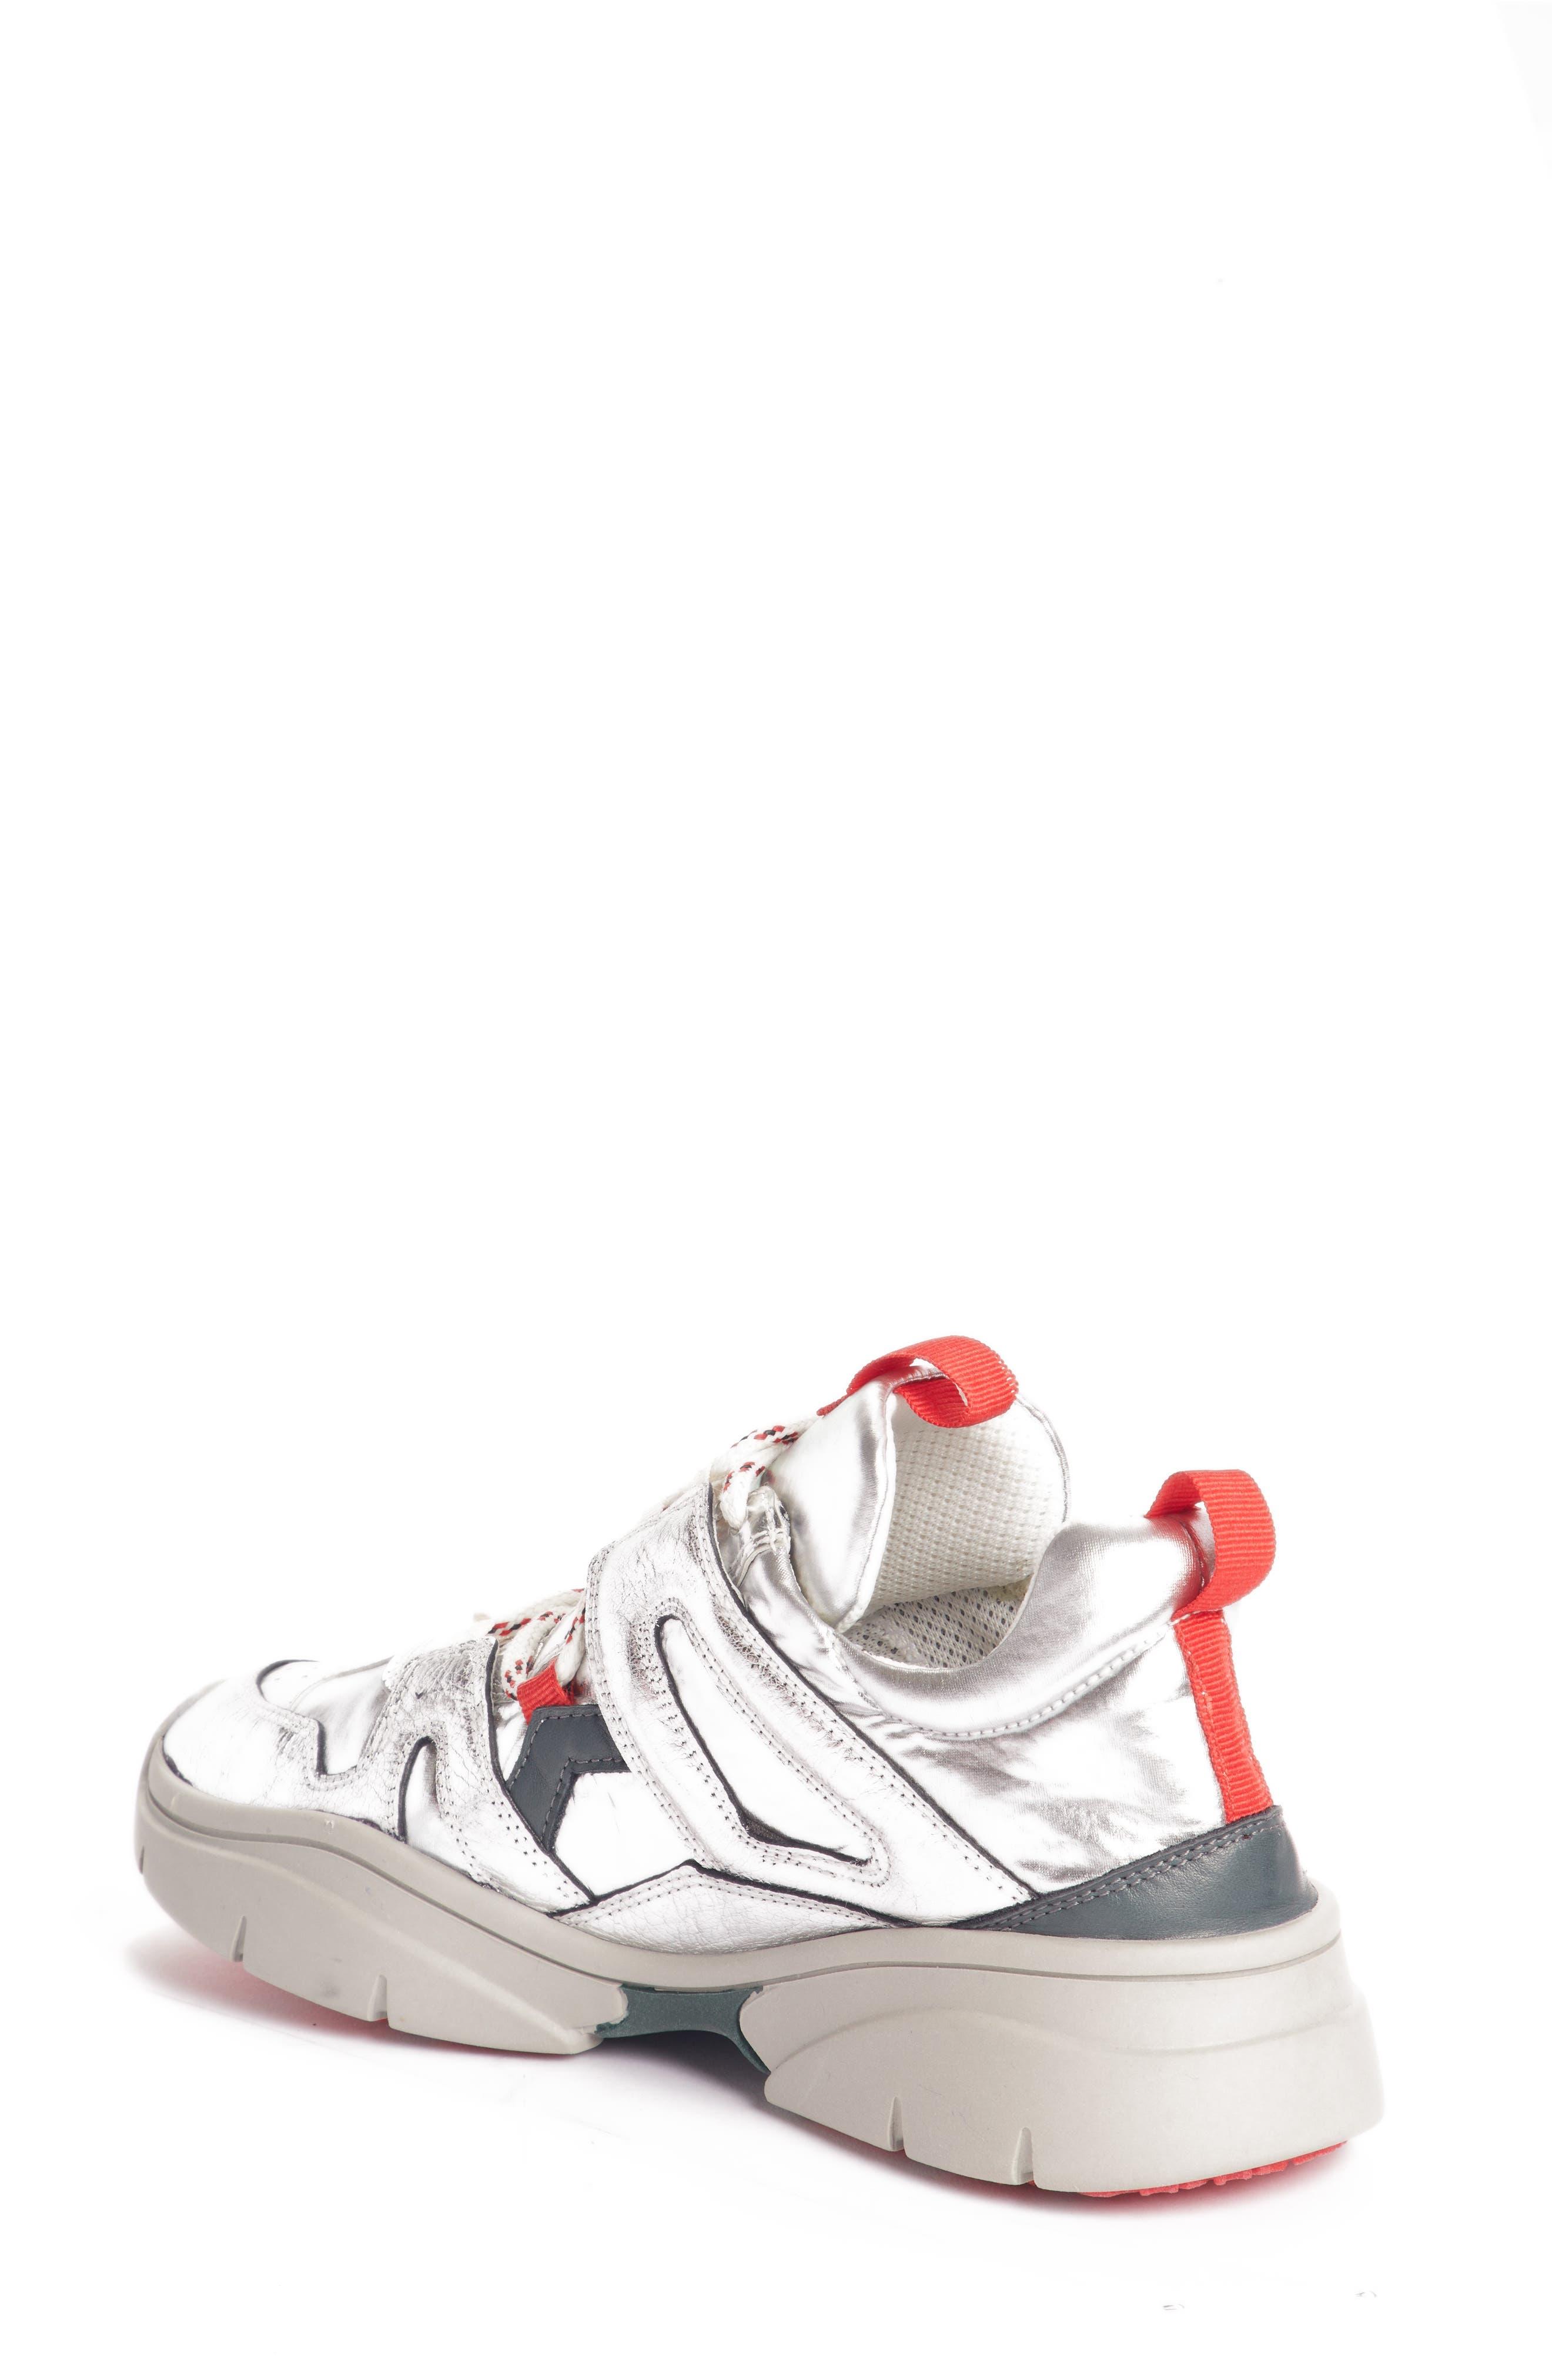 Kindsay Sneaker,                             Alternate thumbnail 2, color,                             040